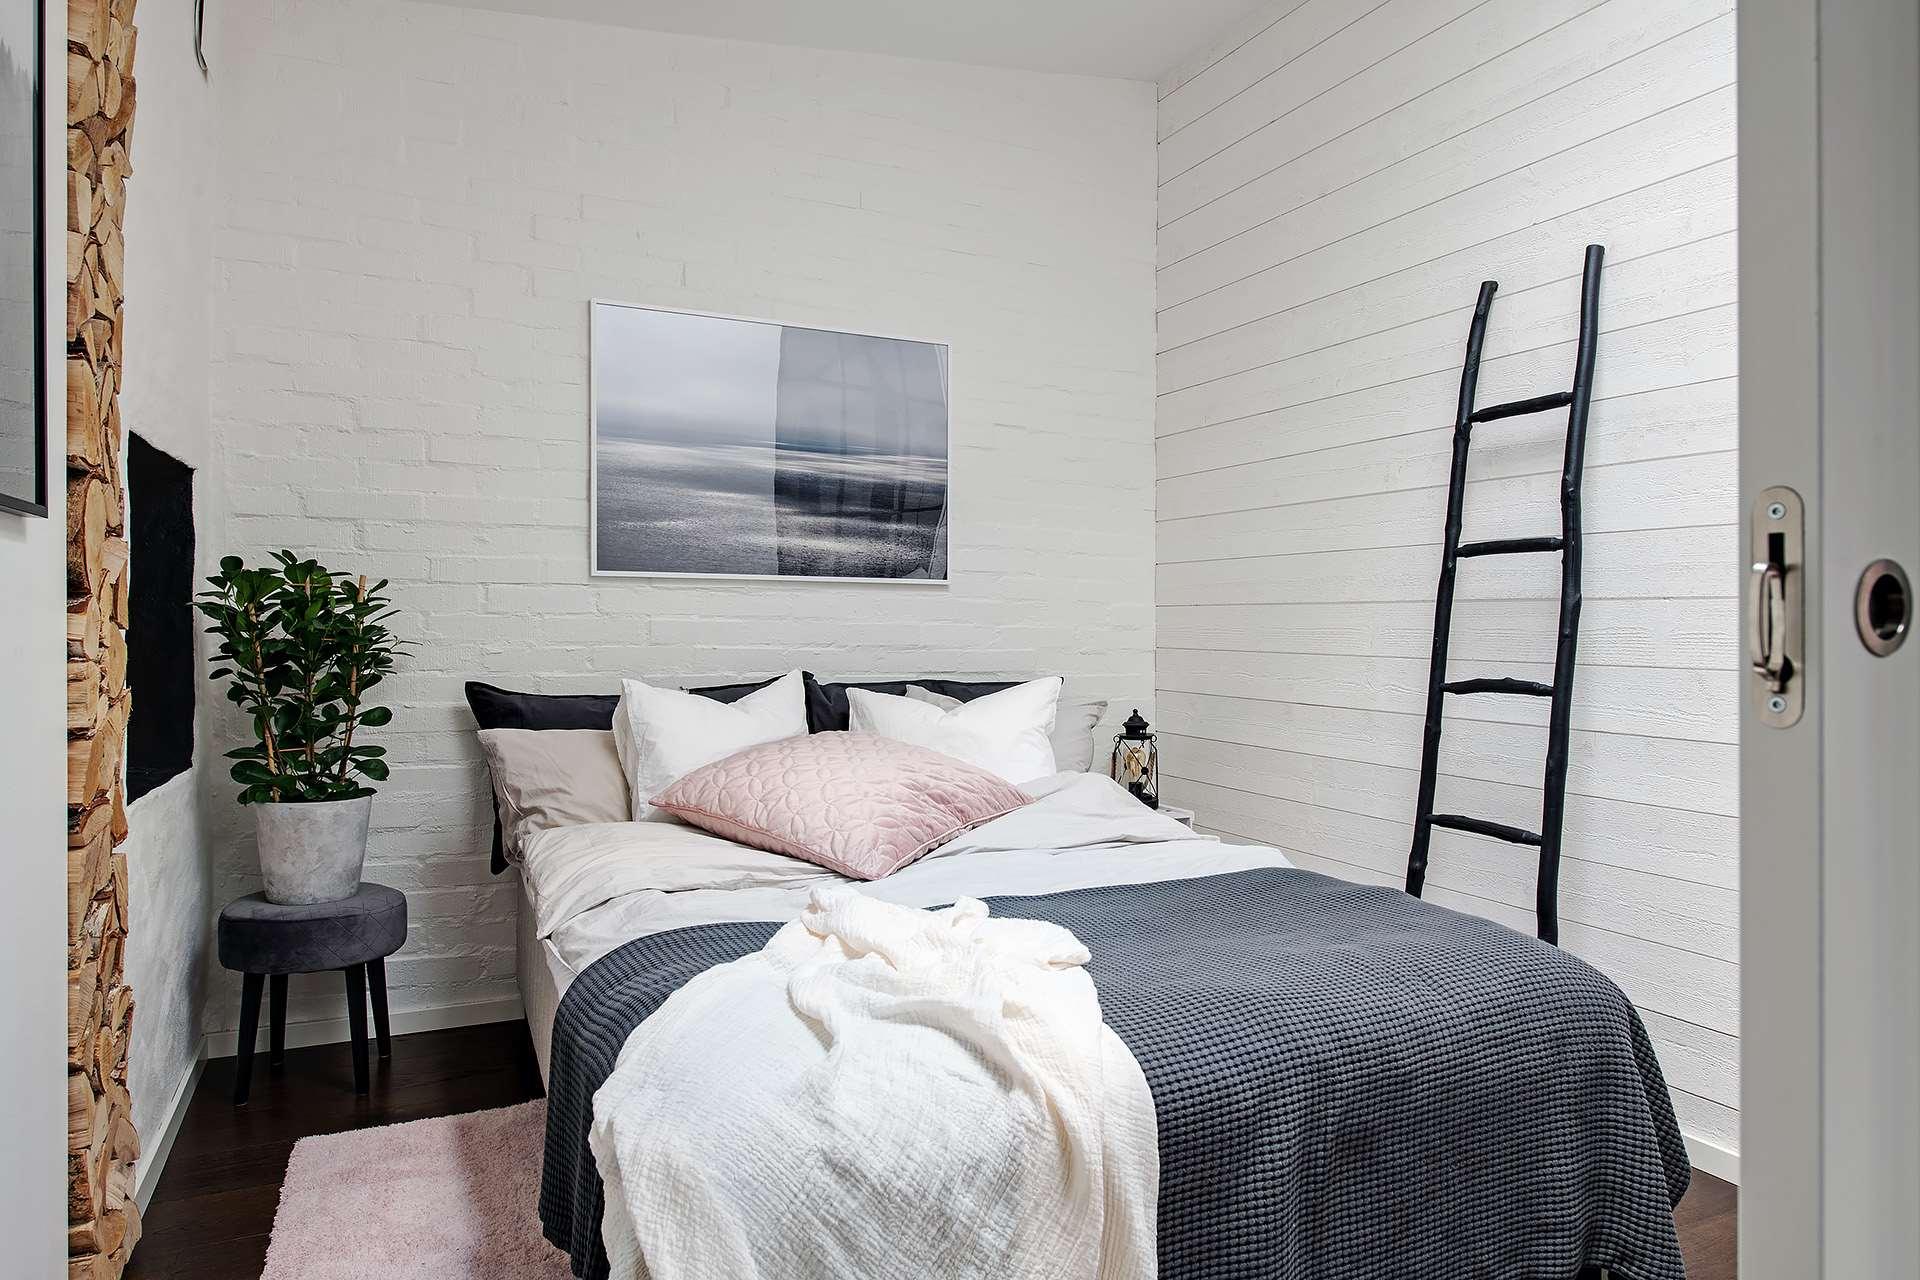 The Nordroom - A Cozy Scandinavian Attic Apartment